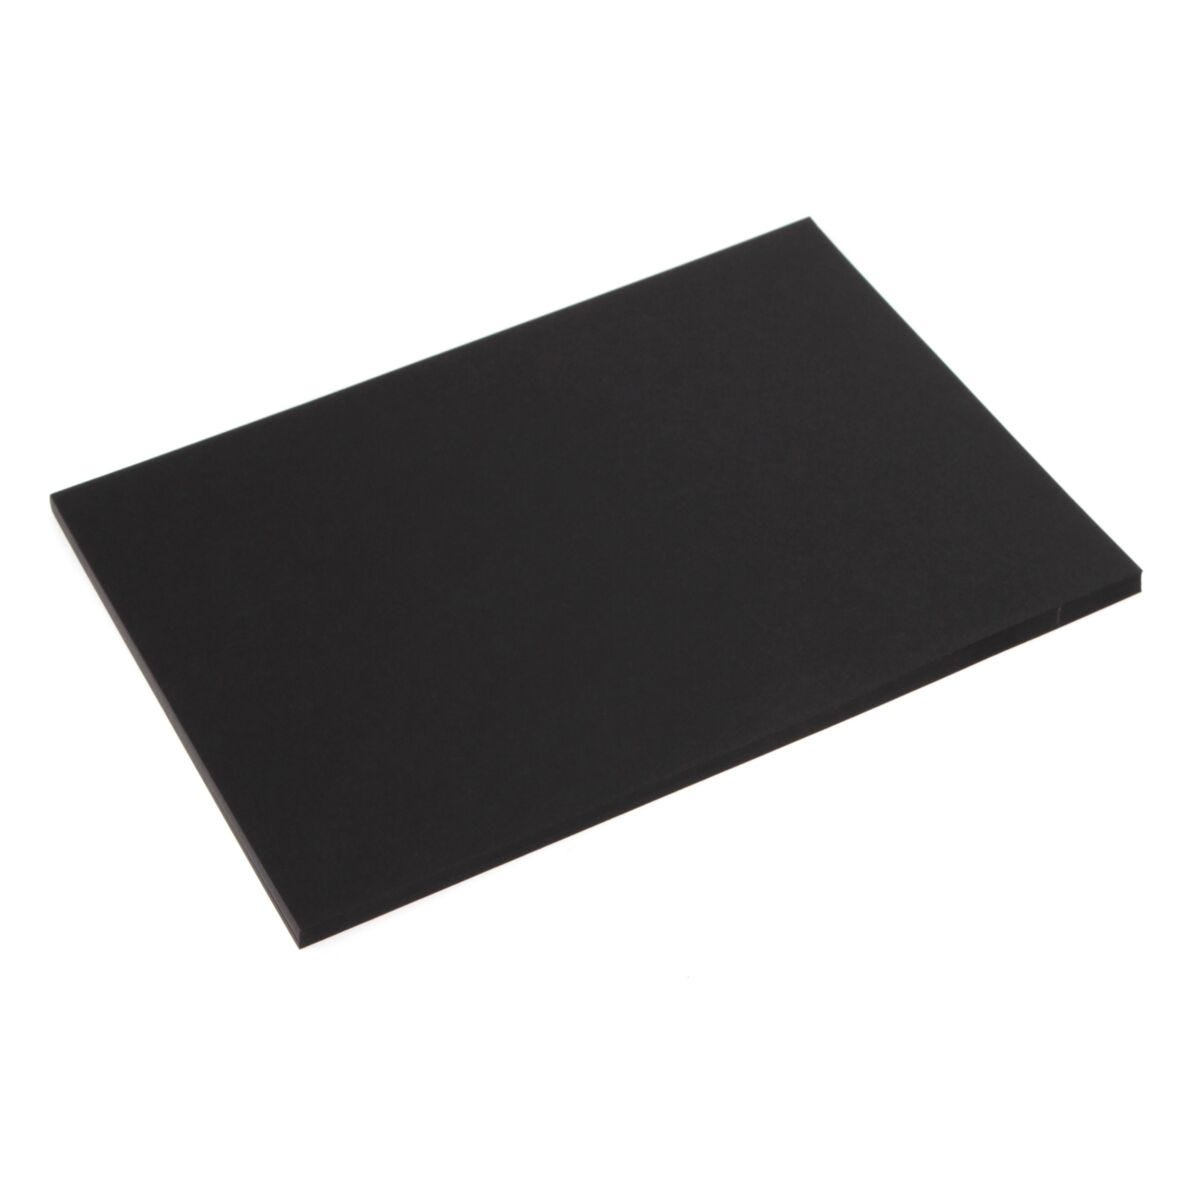 Ryman Artcard A4 210gsm Pack of 20